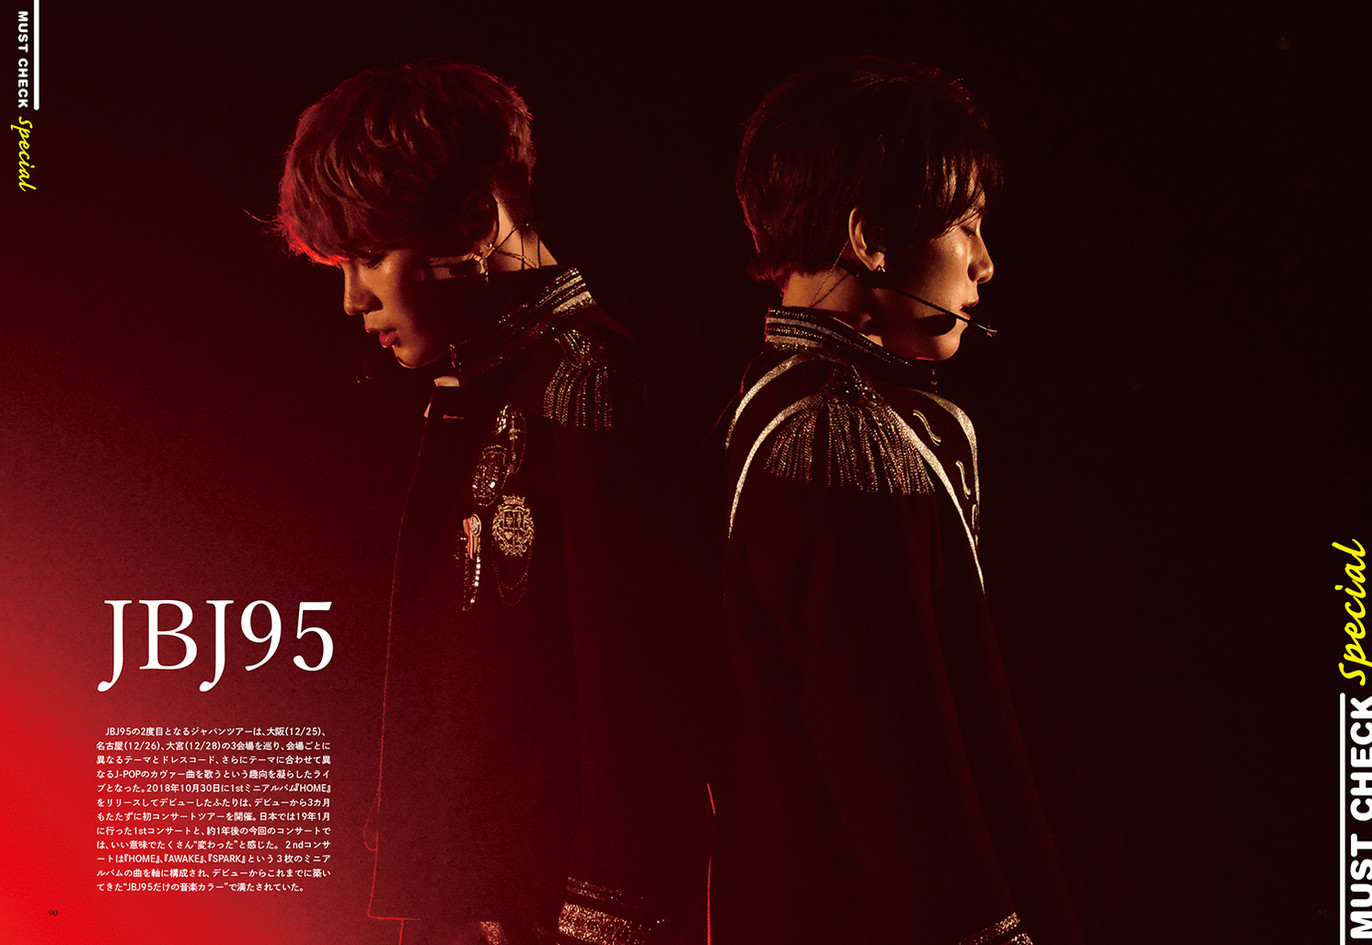 K-popぴあ10_JBJ95_扉s.jpg